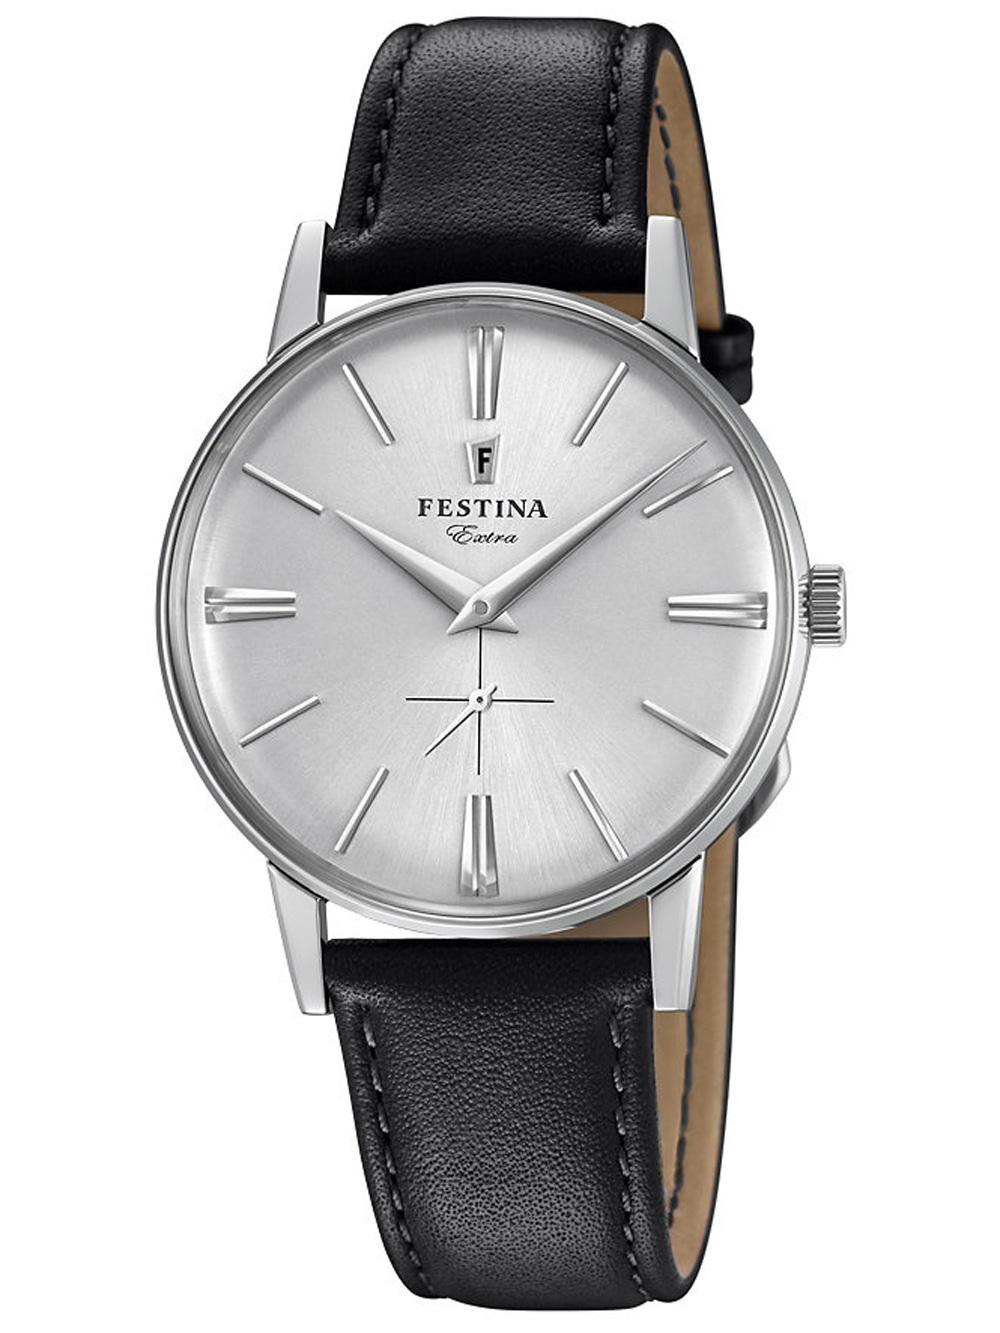 Festina F20248/1 Extra 1948 Herren 36mm 3ATM